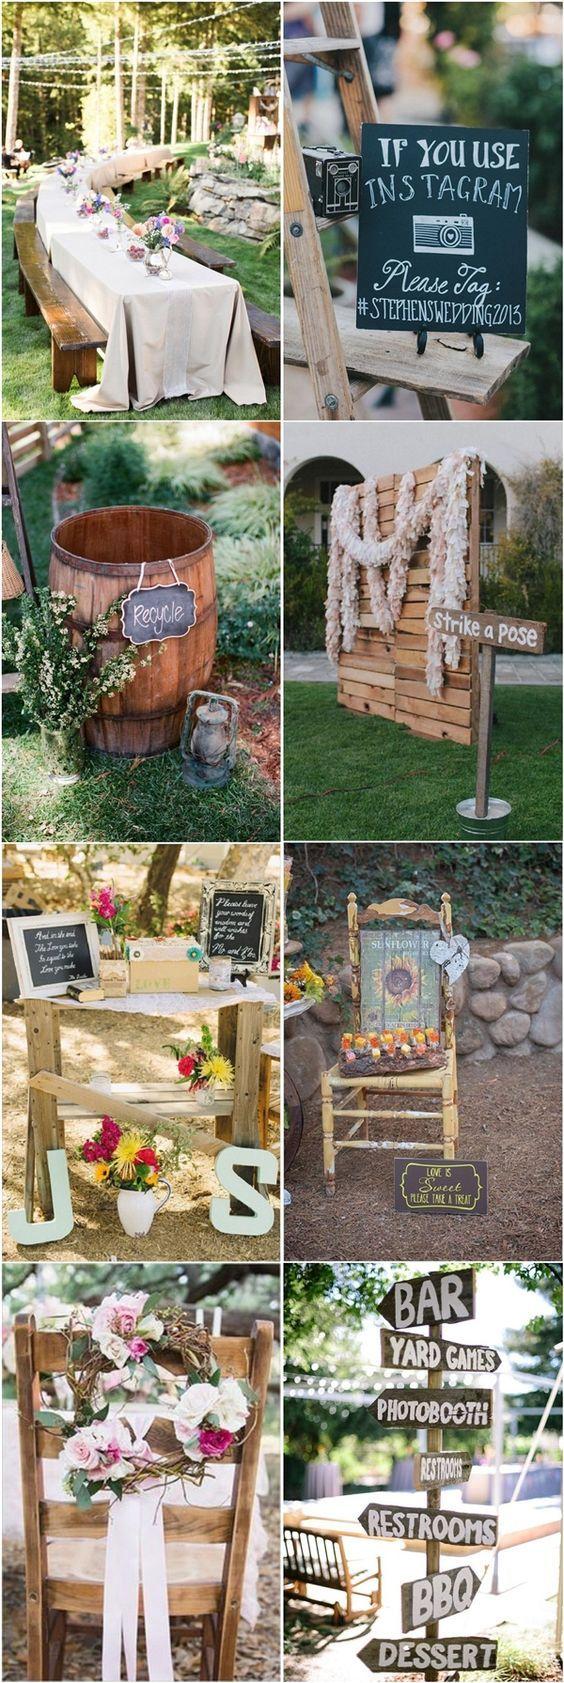 Country yard decor ideas - Rustic Country Backyard Wedding Decor Ideas